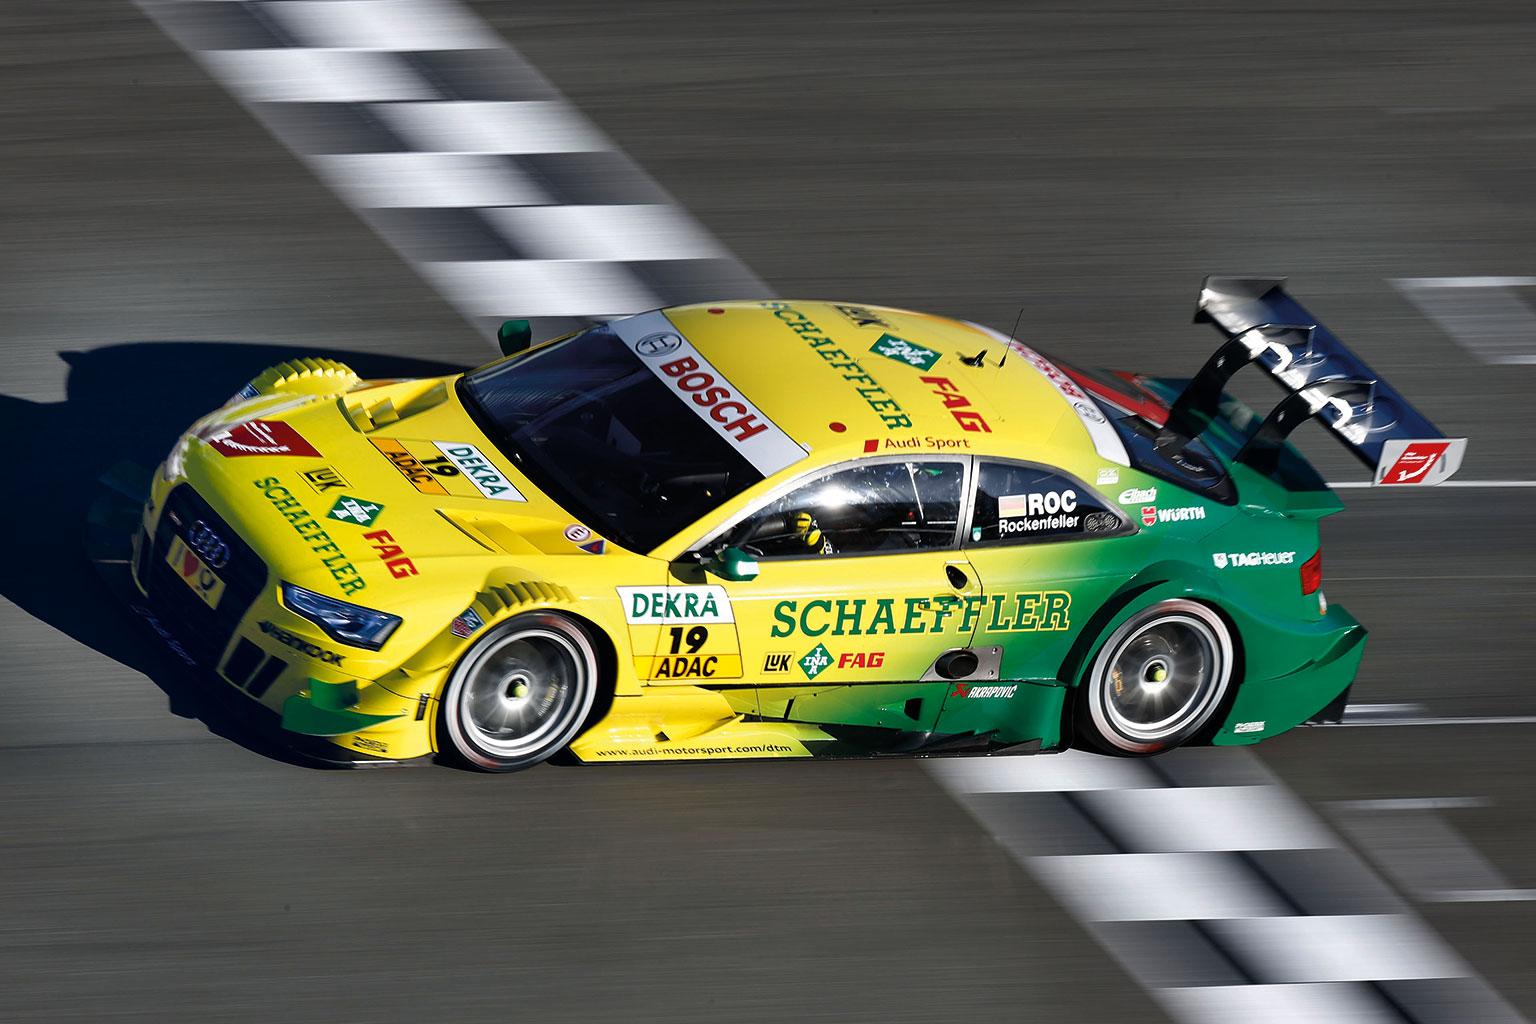 2013RockenfellerDTM_Audi